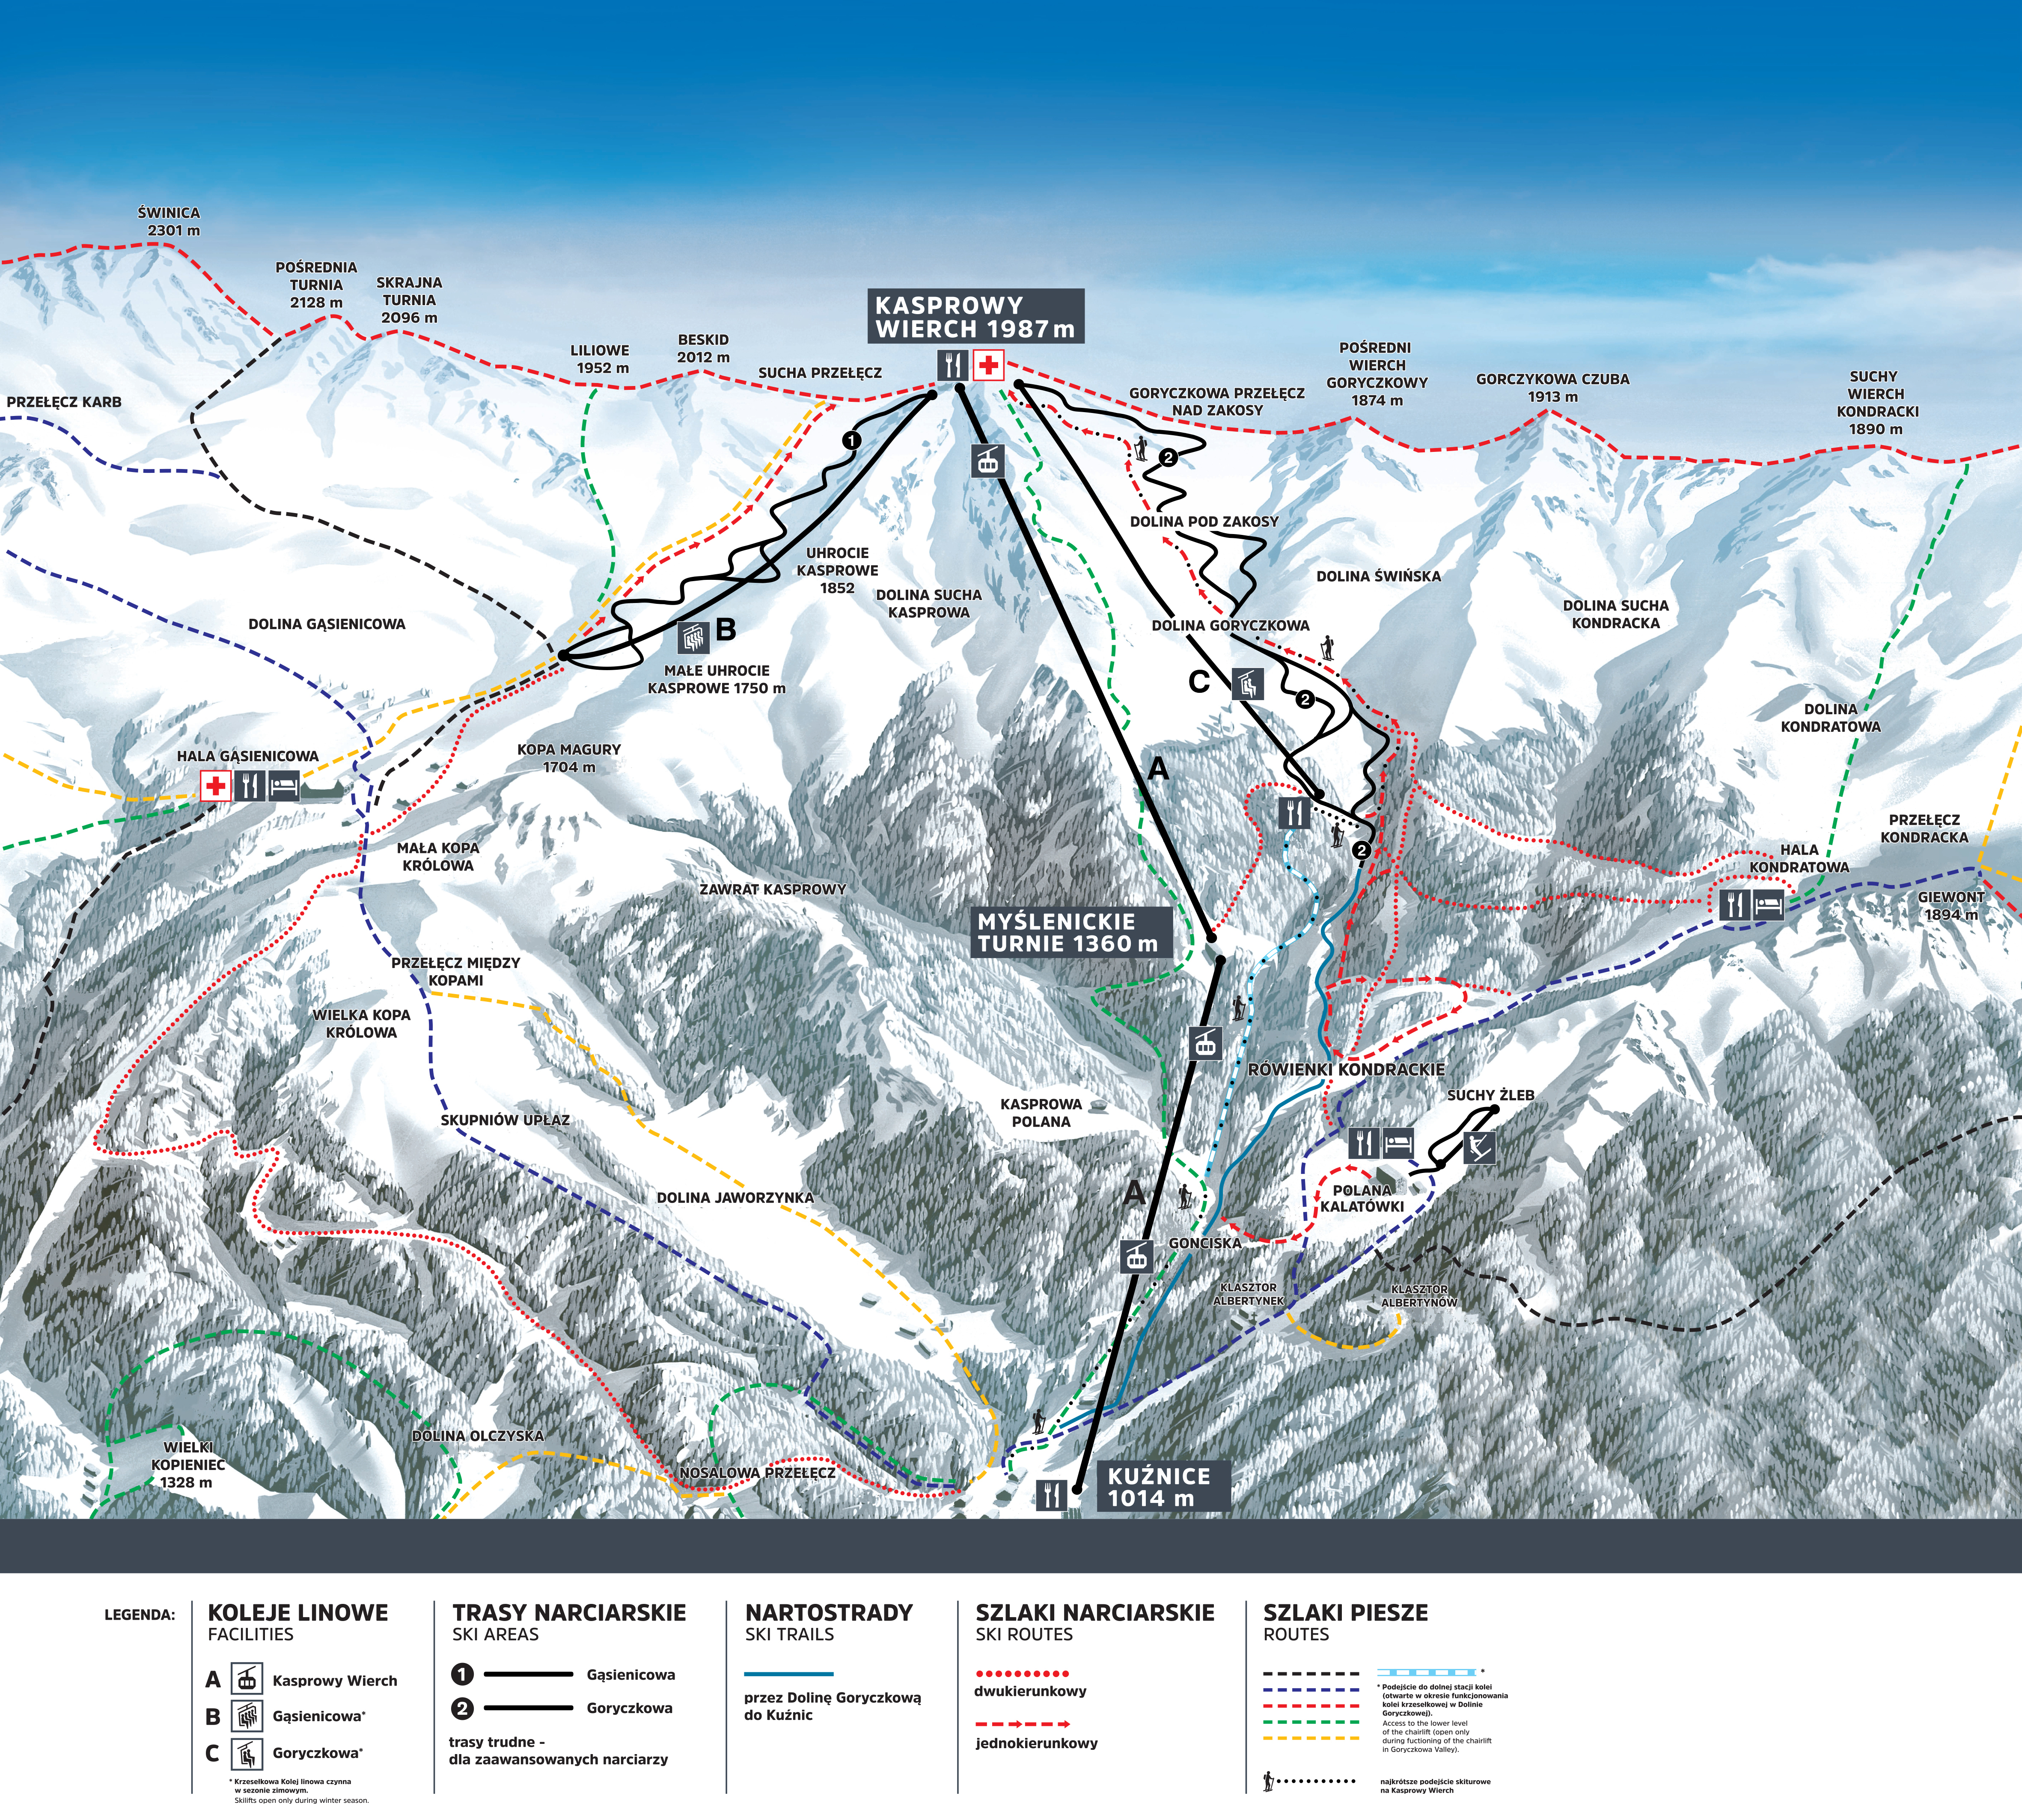 Zakopane Kasprowy Wierch Piste Map Plan Of Ski Slopes And Lifts